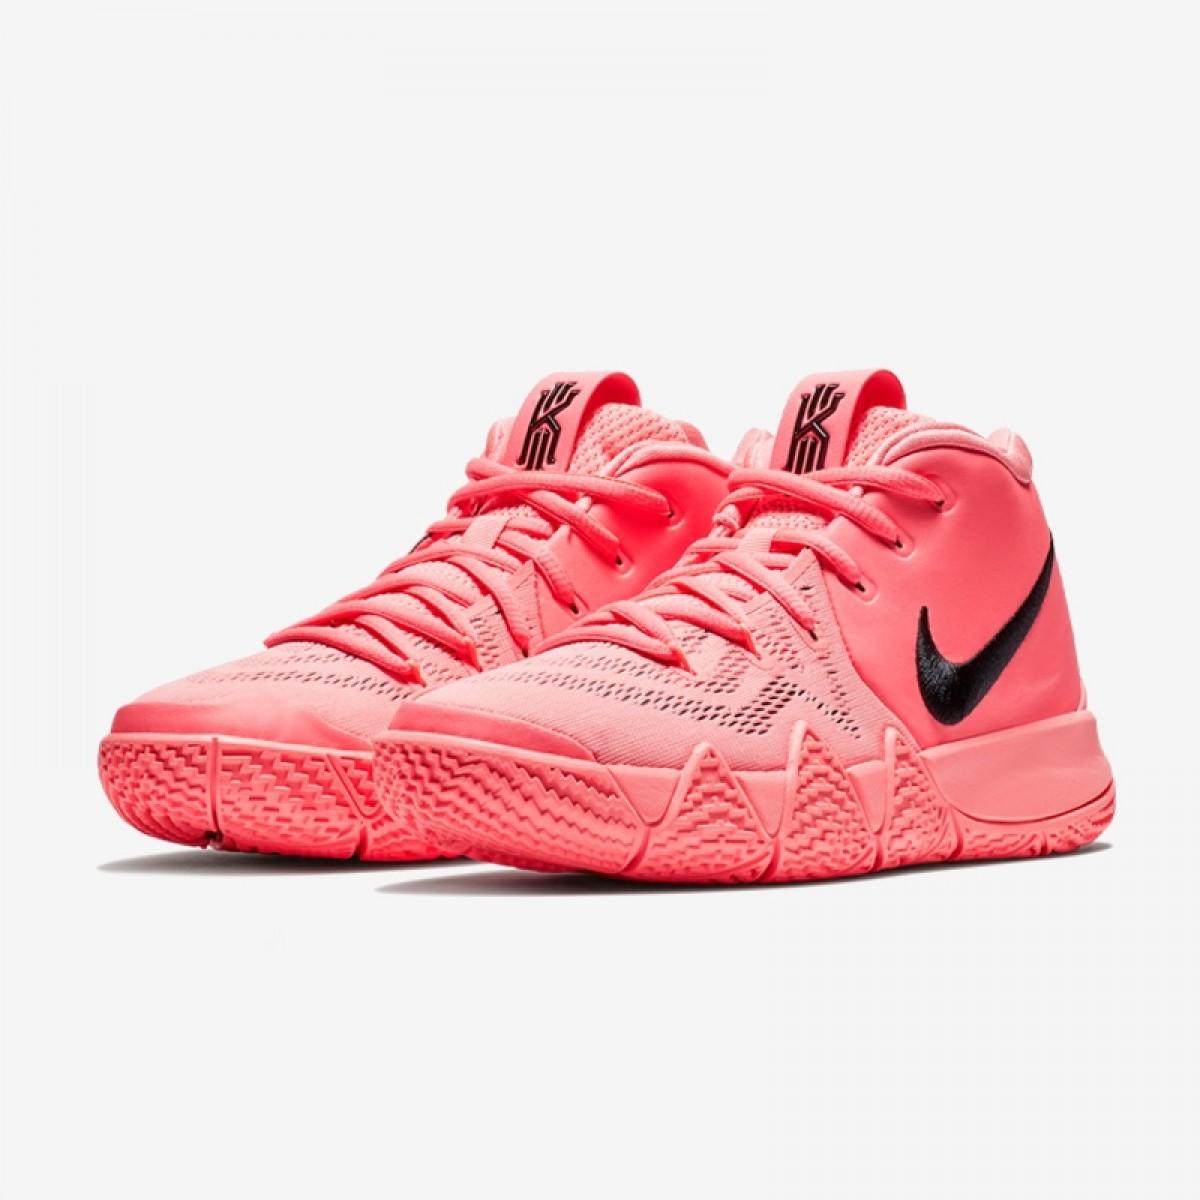 Buy Nike Kyrie 4 GS 'Atomic Pink